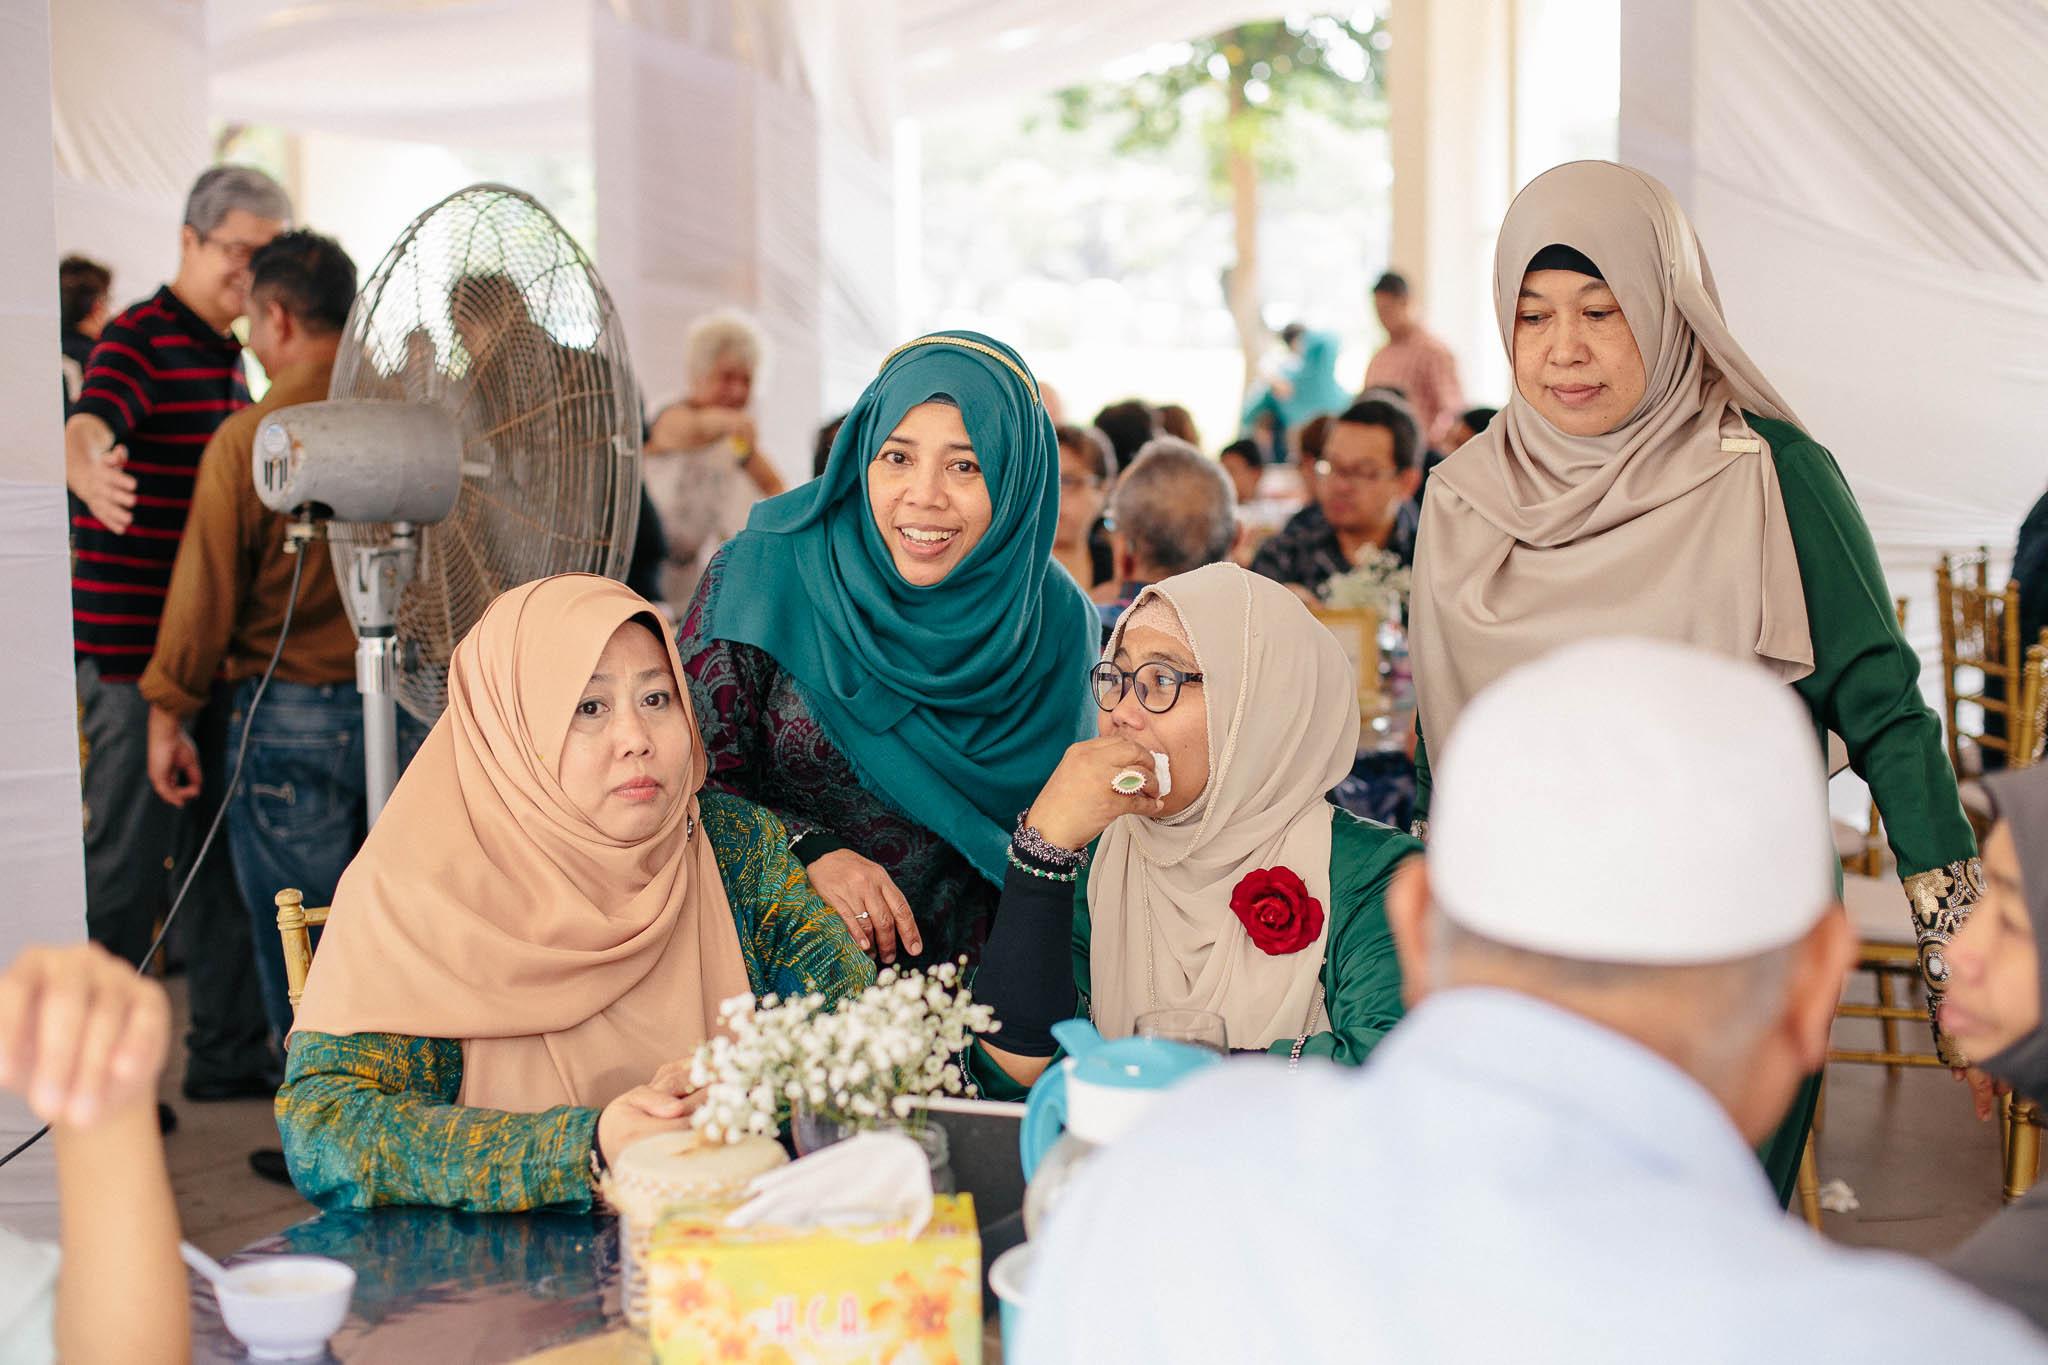 singapore-wedding-photographer-sharalyn-syazwan-023.jpg